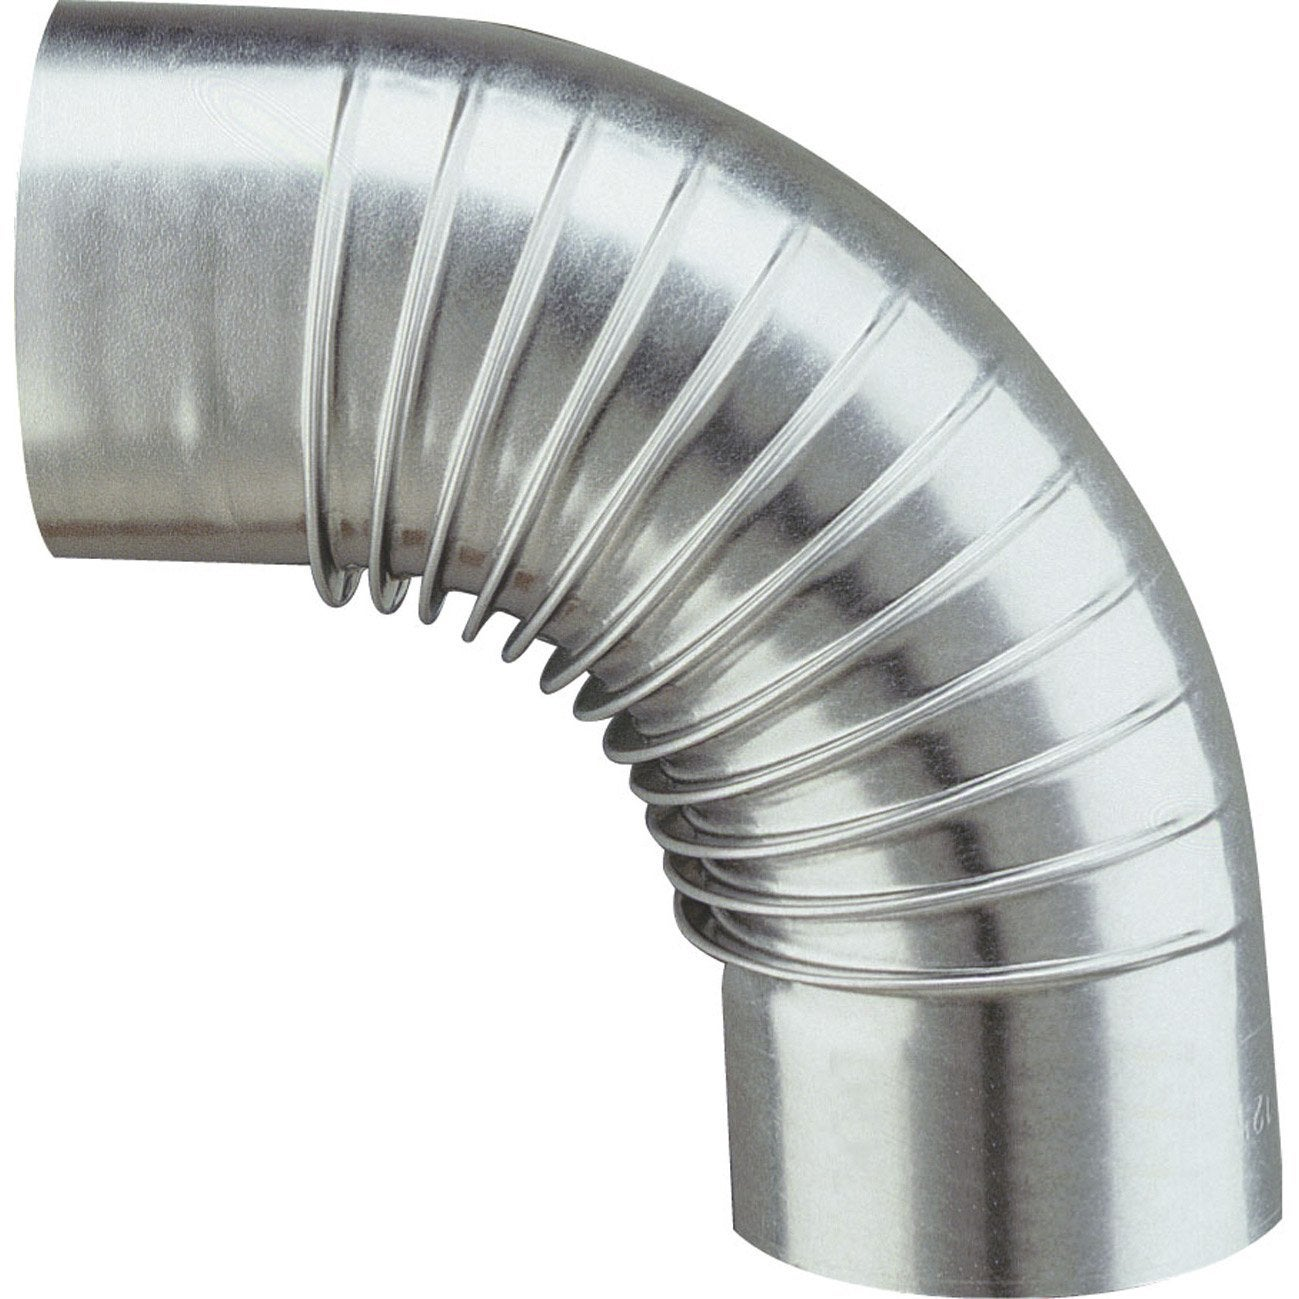 coude pliss alumini de raccordement poujoulat diam 125 mm 90 leroy merlin. Black Bedroom Furniture Sets. Home Design Ideas